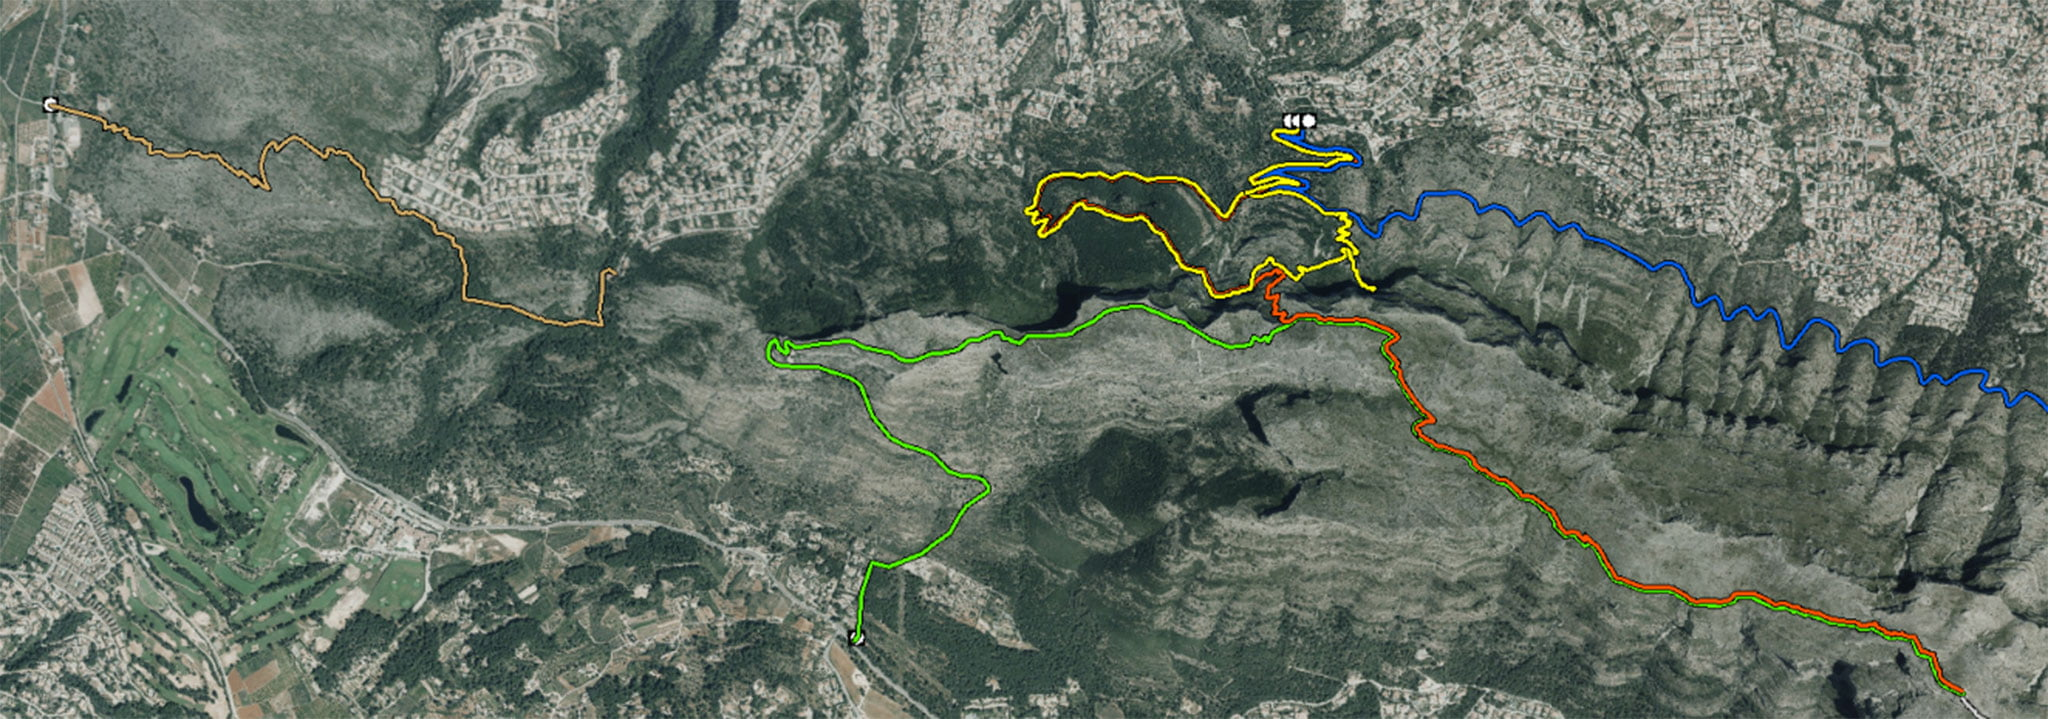 Ruta Benimaquia-Coll de Pous, marcada en marrón claro, a la izquierda de la imagen (Fuente: Parques Naturales de la Generalitat Valenciana)